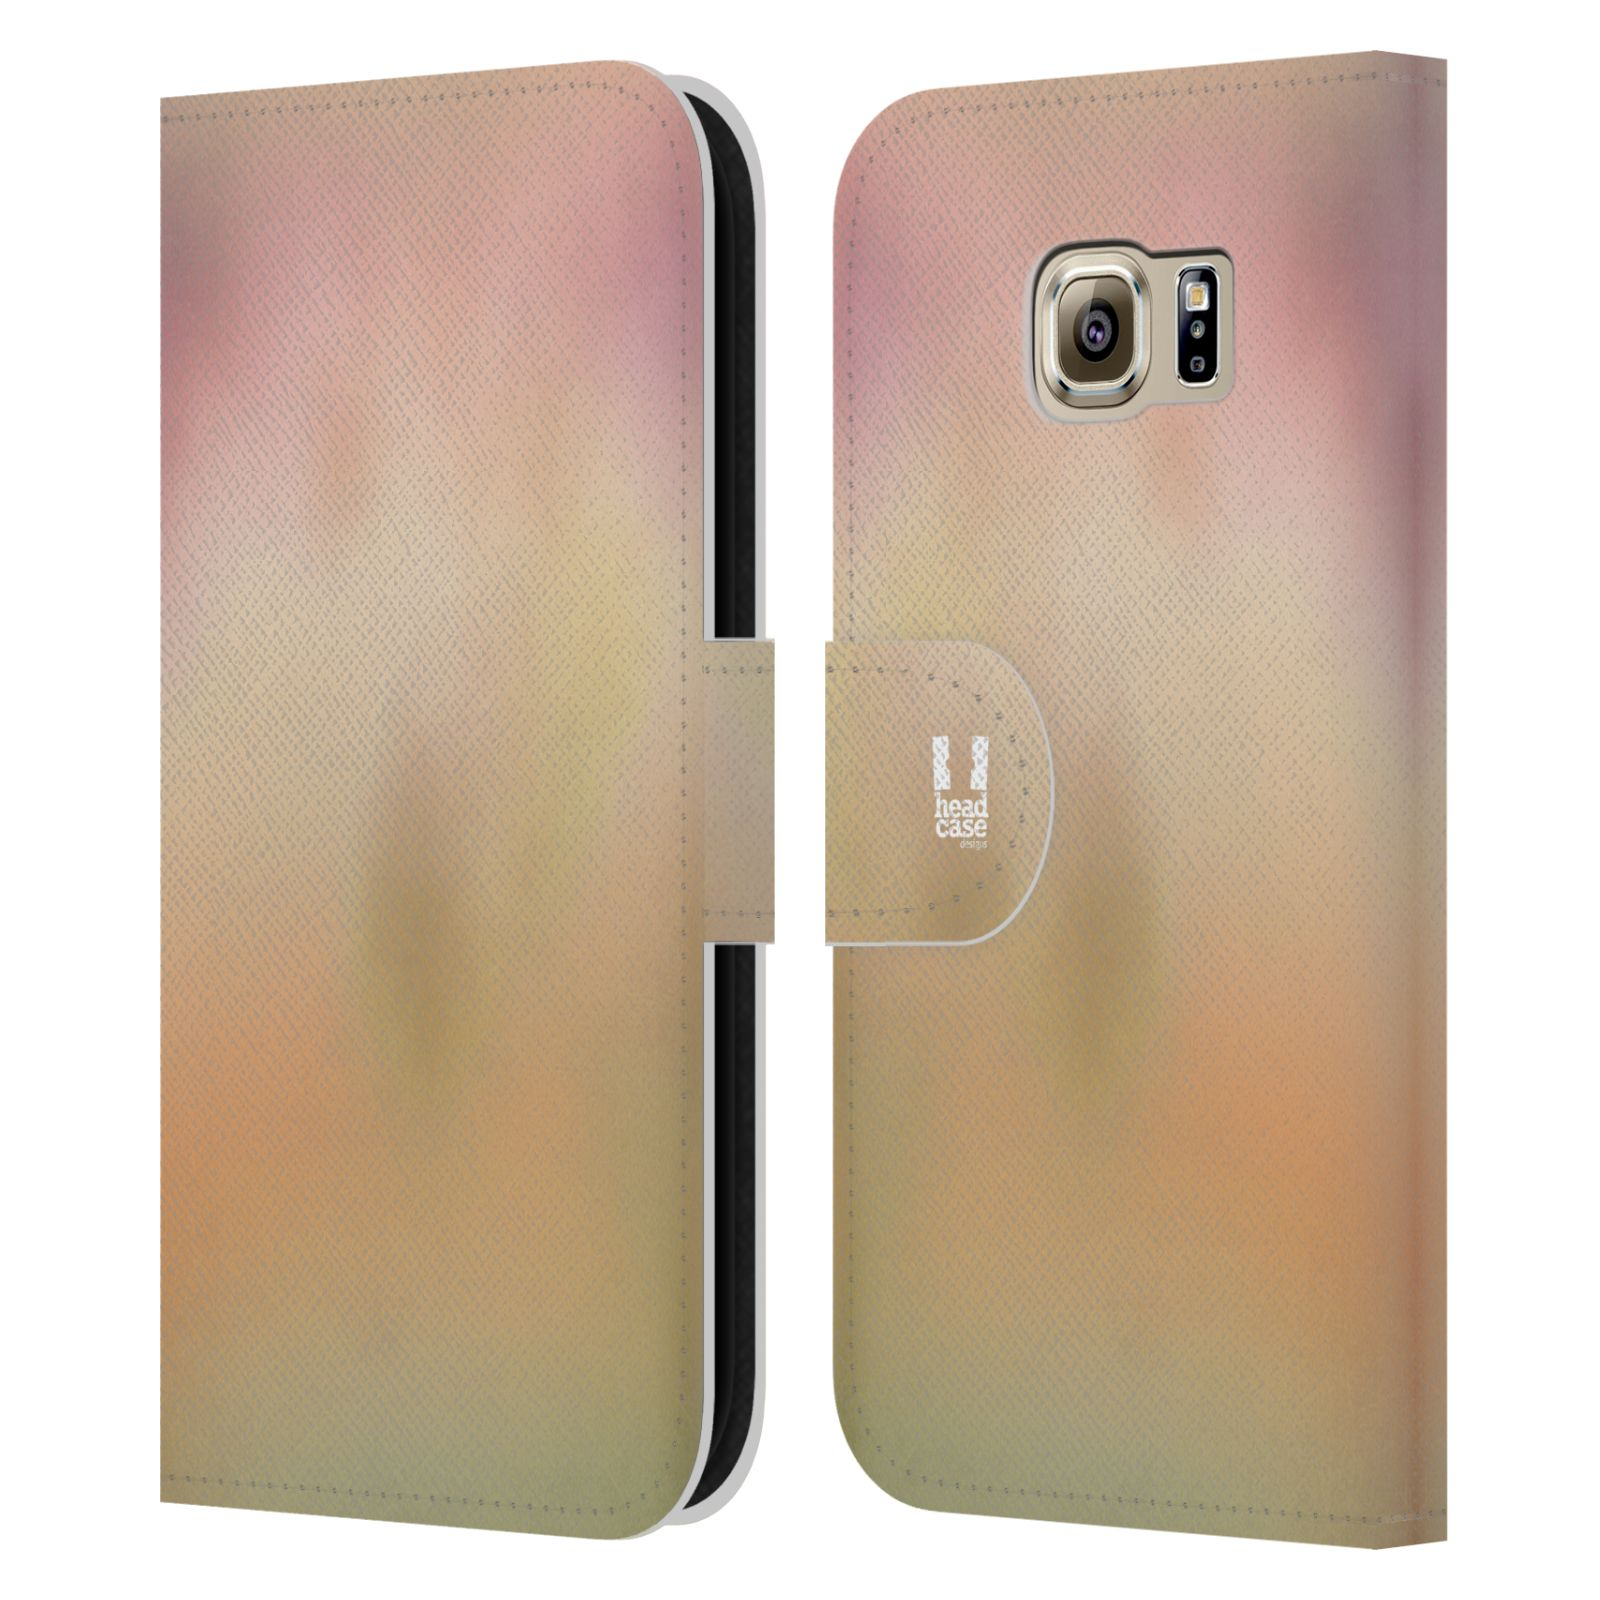 HEAD CASE Flipové pouzdro pro mobil Samsung Galaxy S6 (G9200) AQUAREL barvy NOSTALGIE